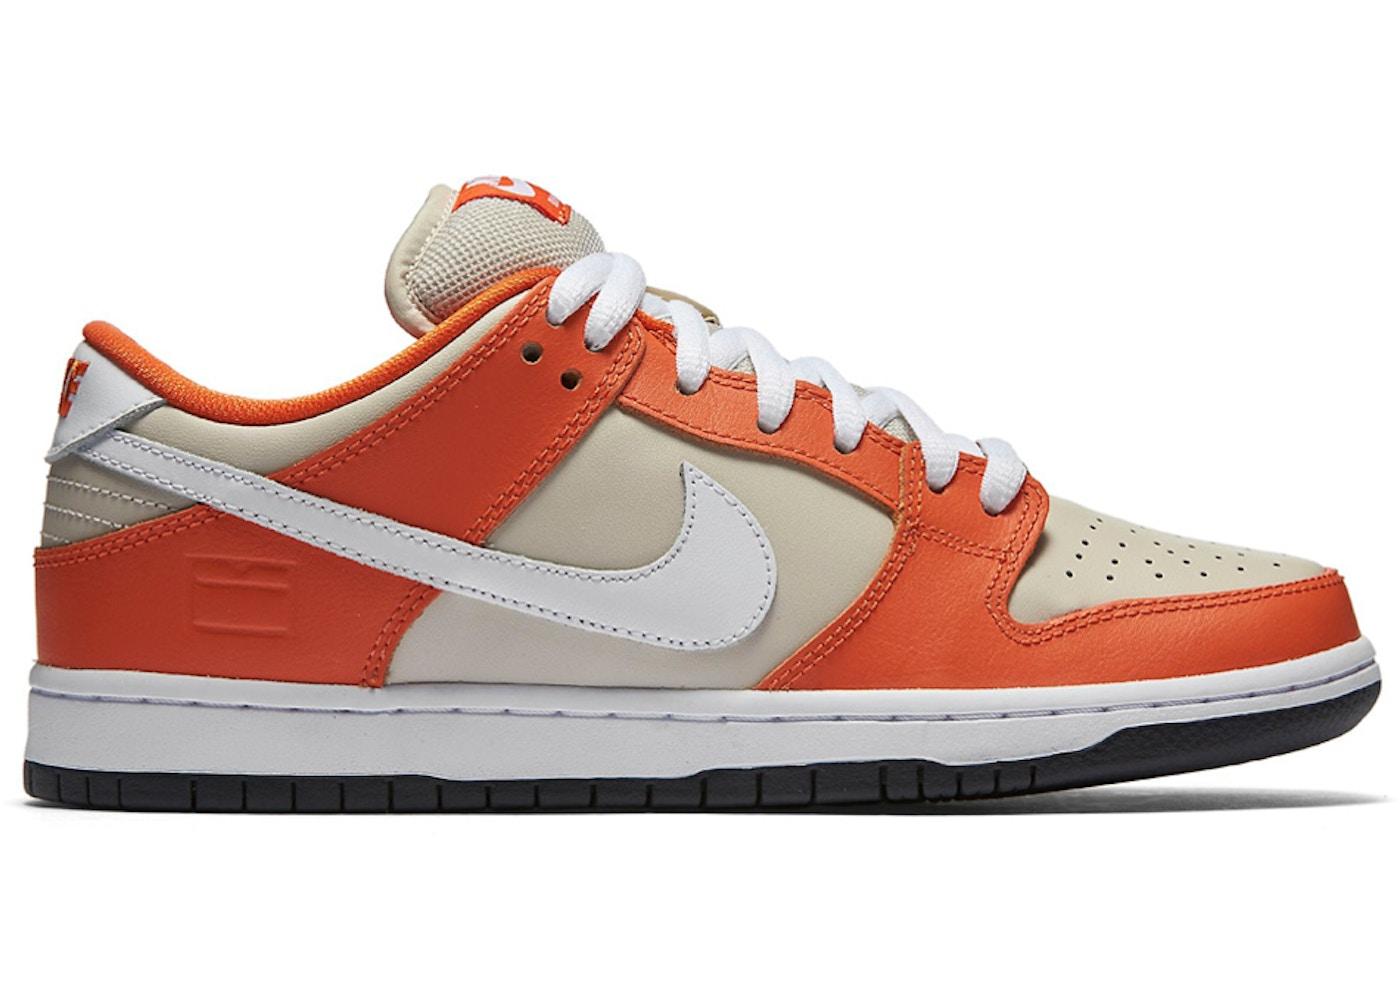 Nike Dunk SB Low Orange Box - 313170-811 55fce79fcb